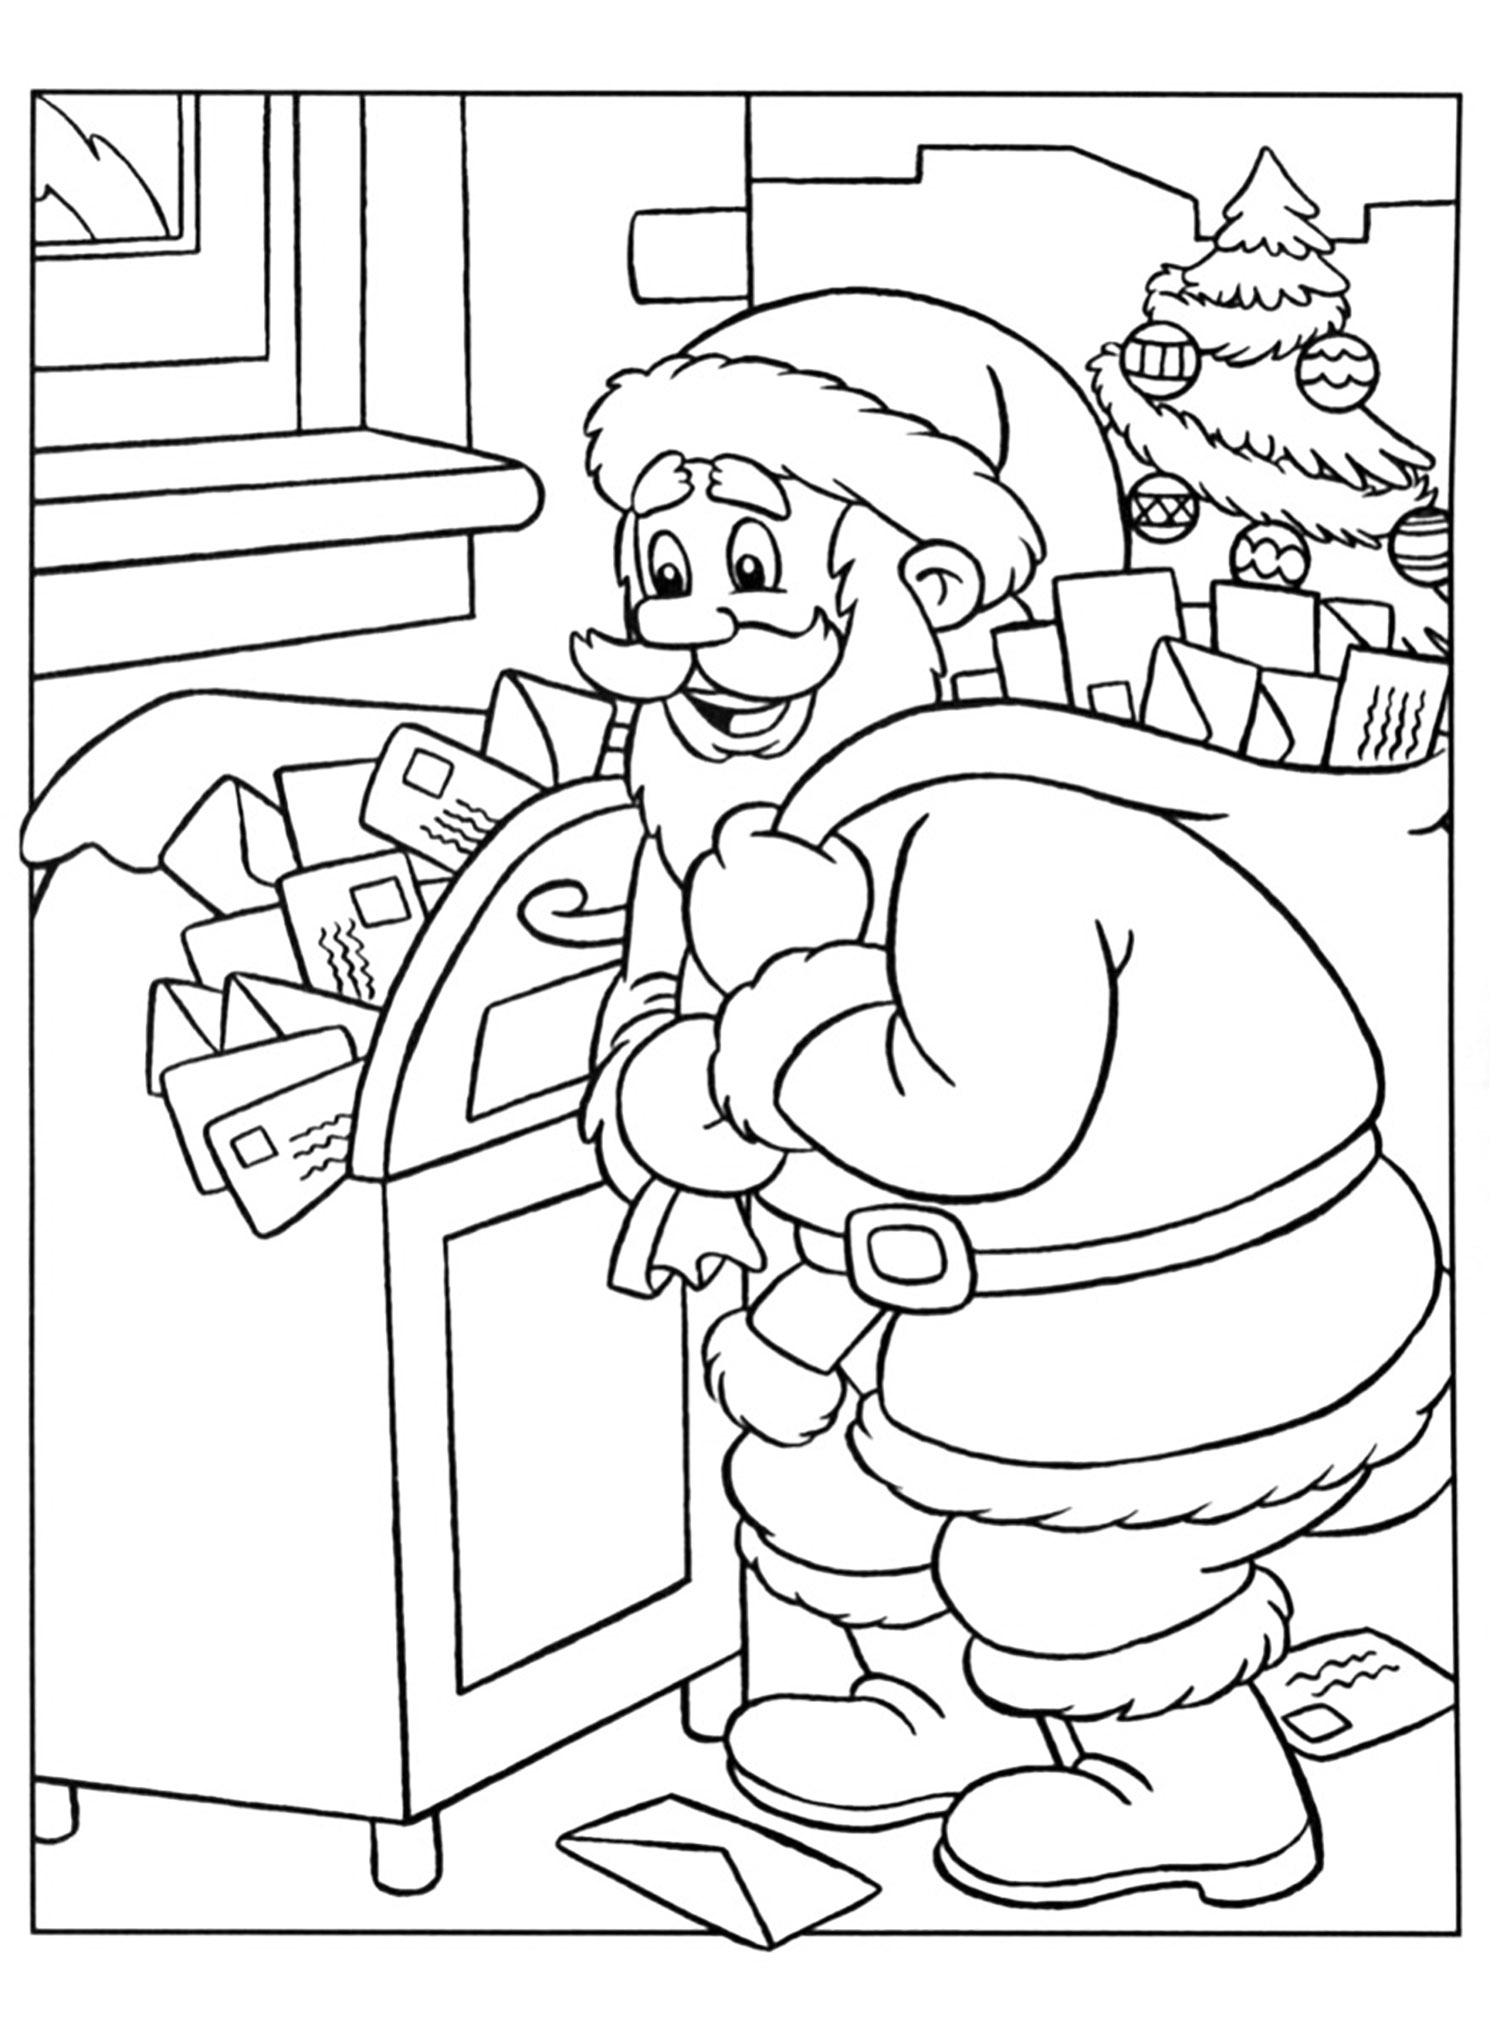 Santa Claus Letters Pages Coloring Pages